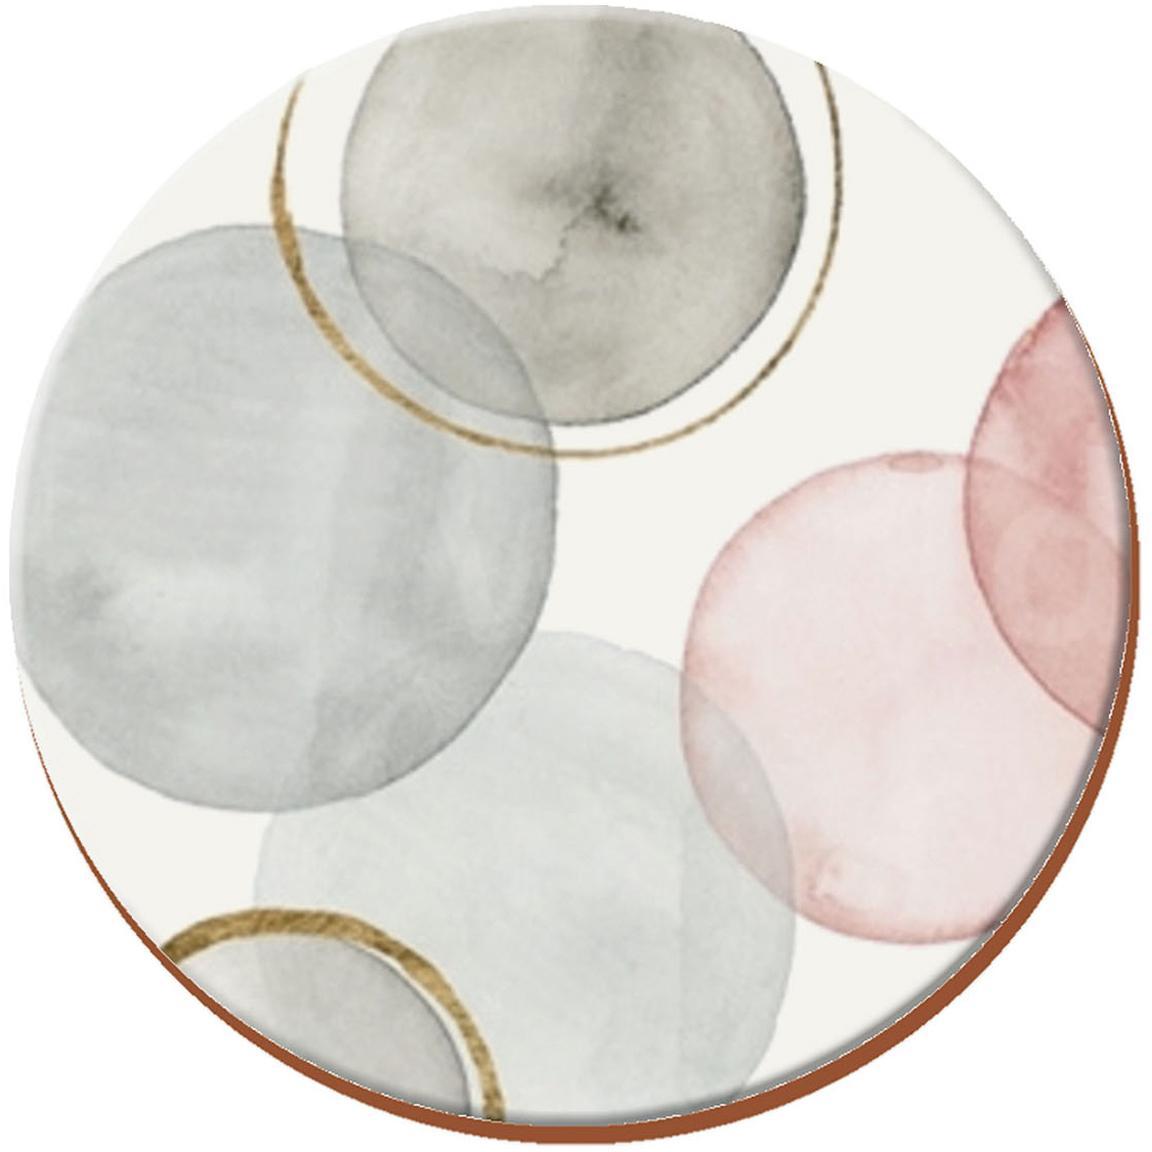 Untersetzer Gilded Spheres, 4 Stück, Kork, Weiß, Grau, Rosa, Ø 12 cm